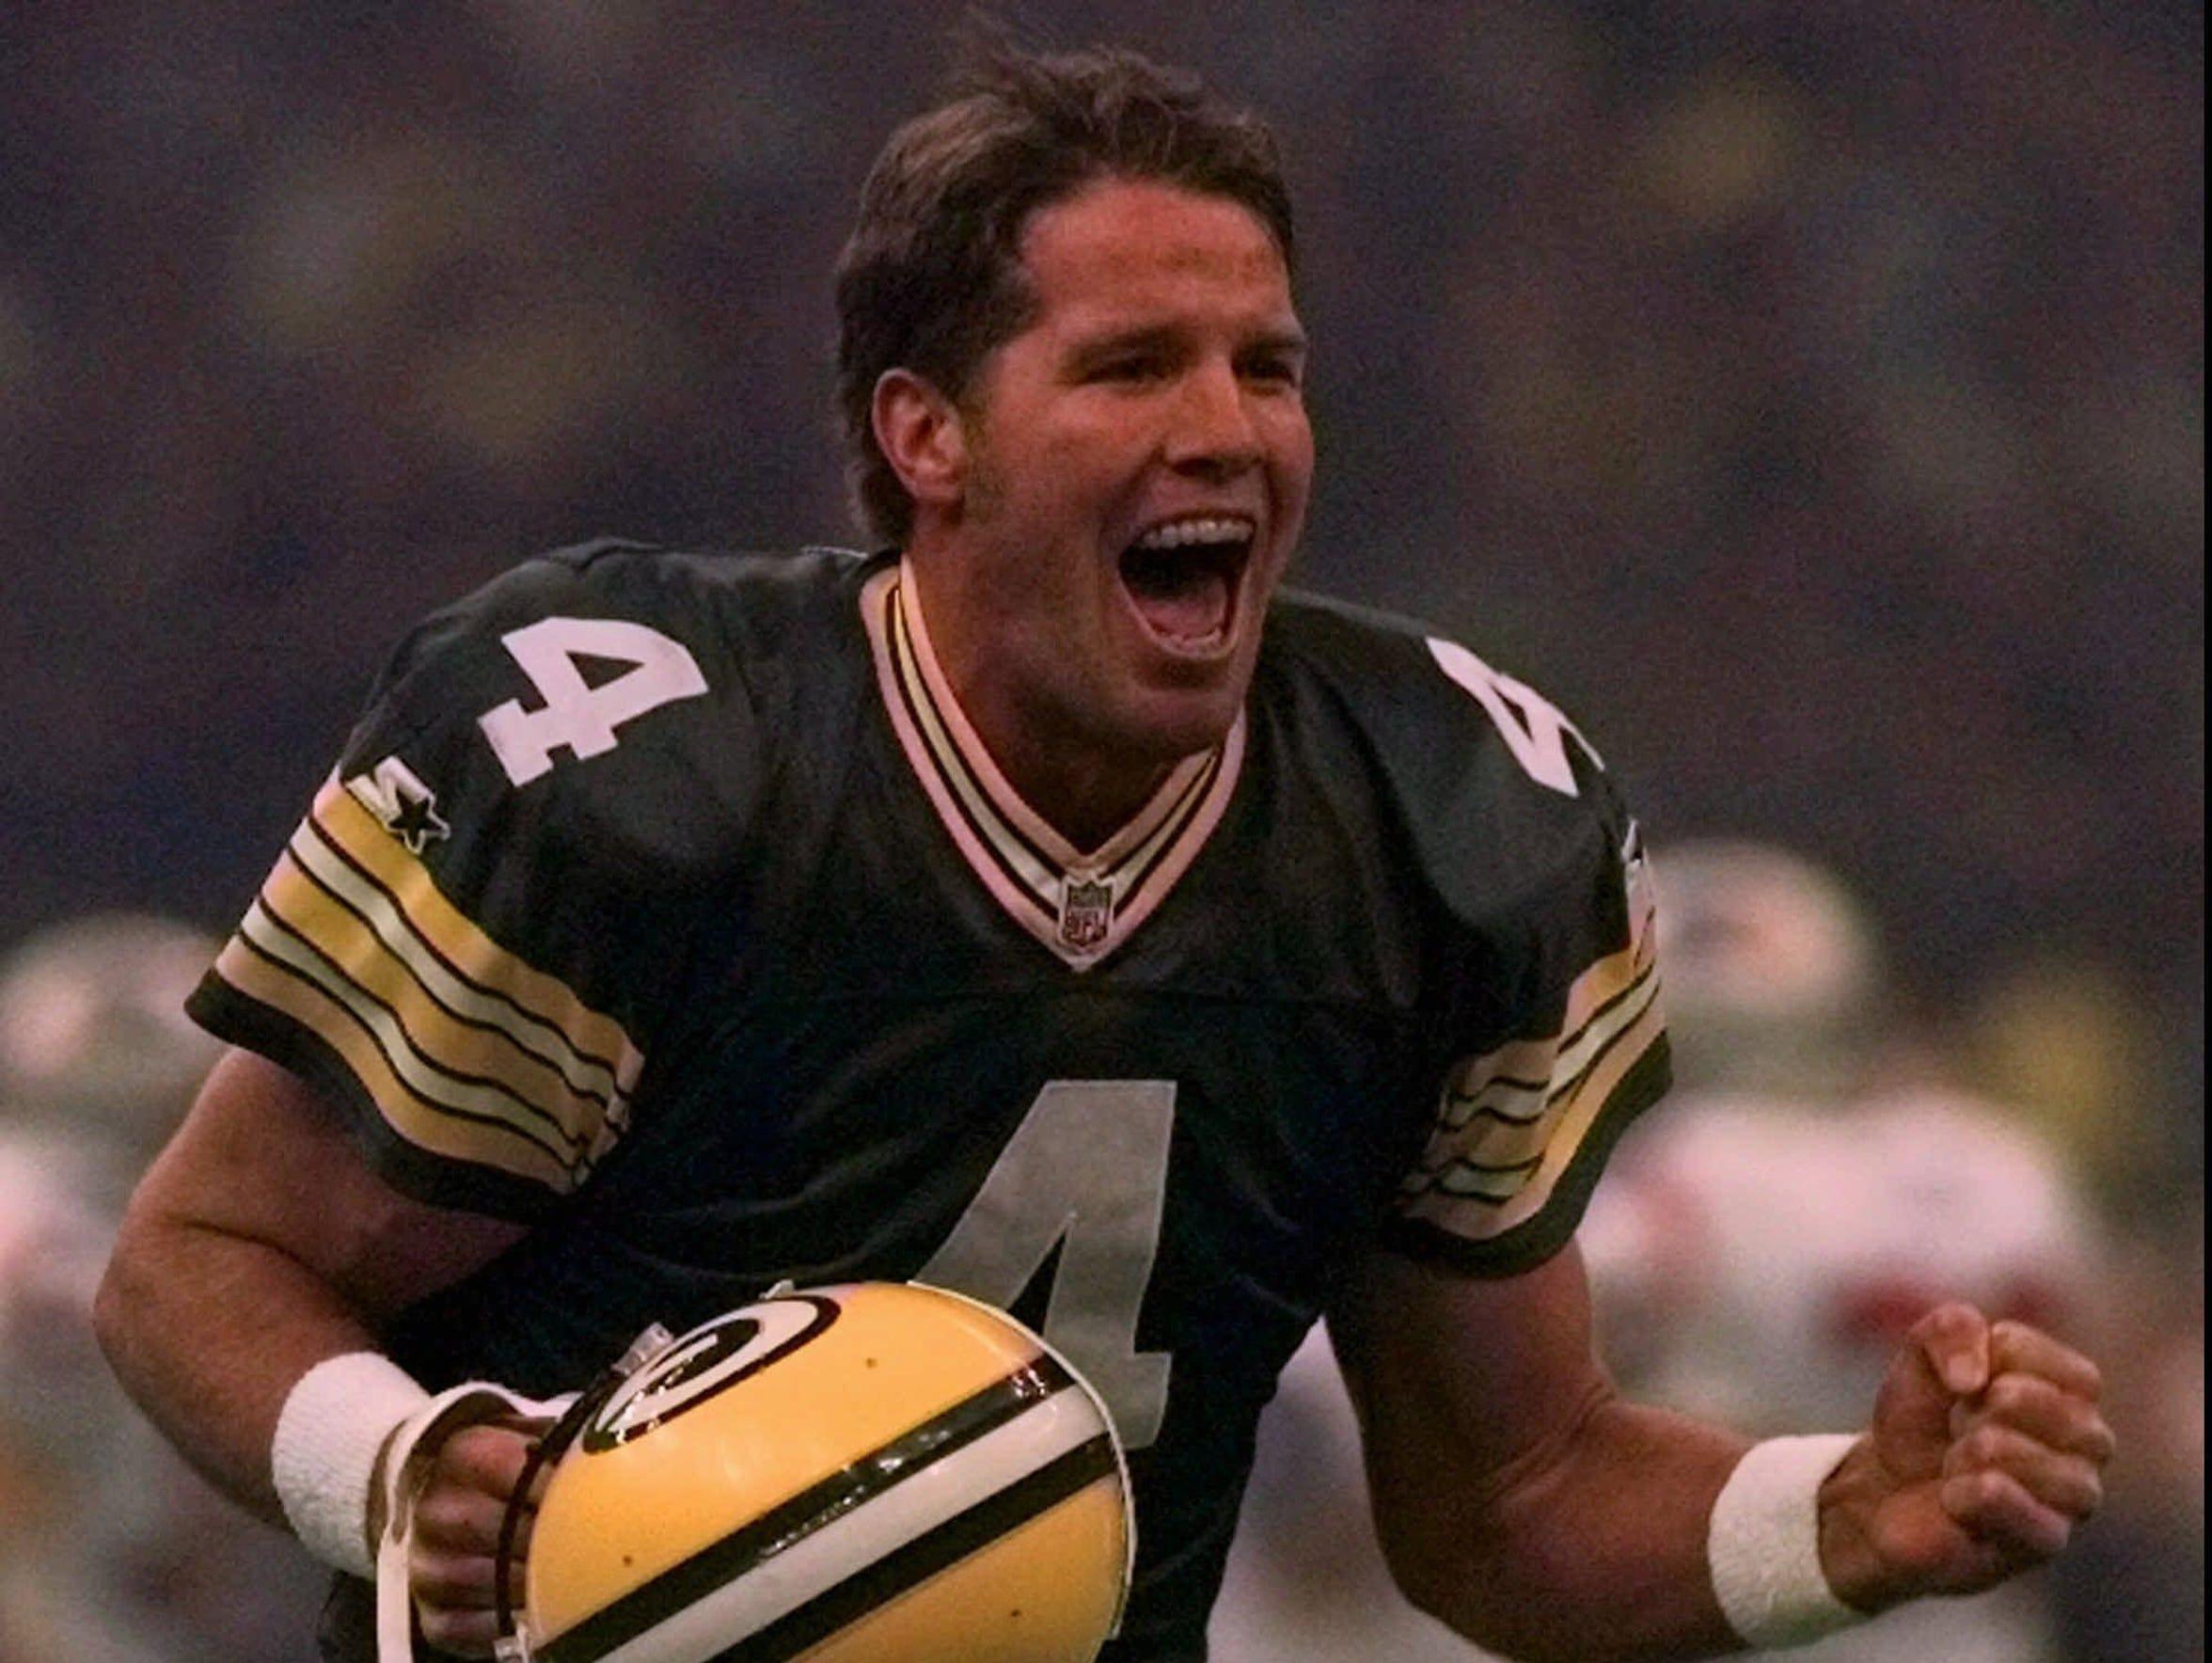 Green Bay Packers quarterback Brett Favre celebrates